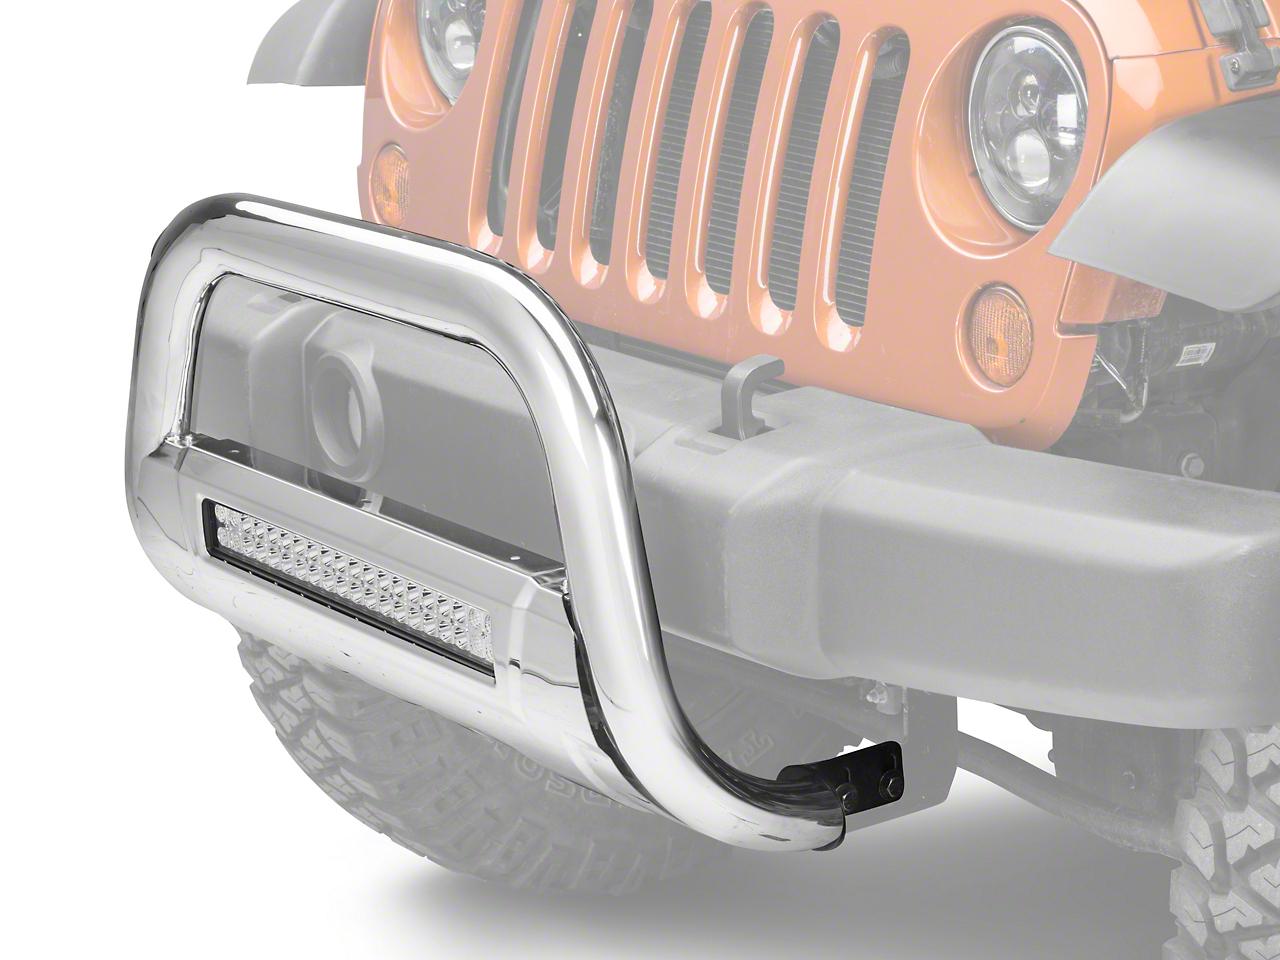 Barricade HD Bull Bar w/ Skid Plate & 20 in. LED Dual-Row LED Light Bar - Polished SS (10-18 Jeep Wrangler JK)